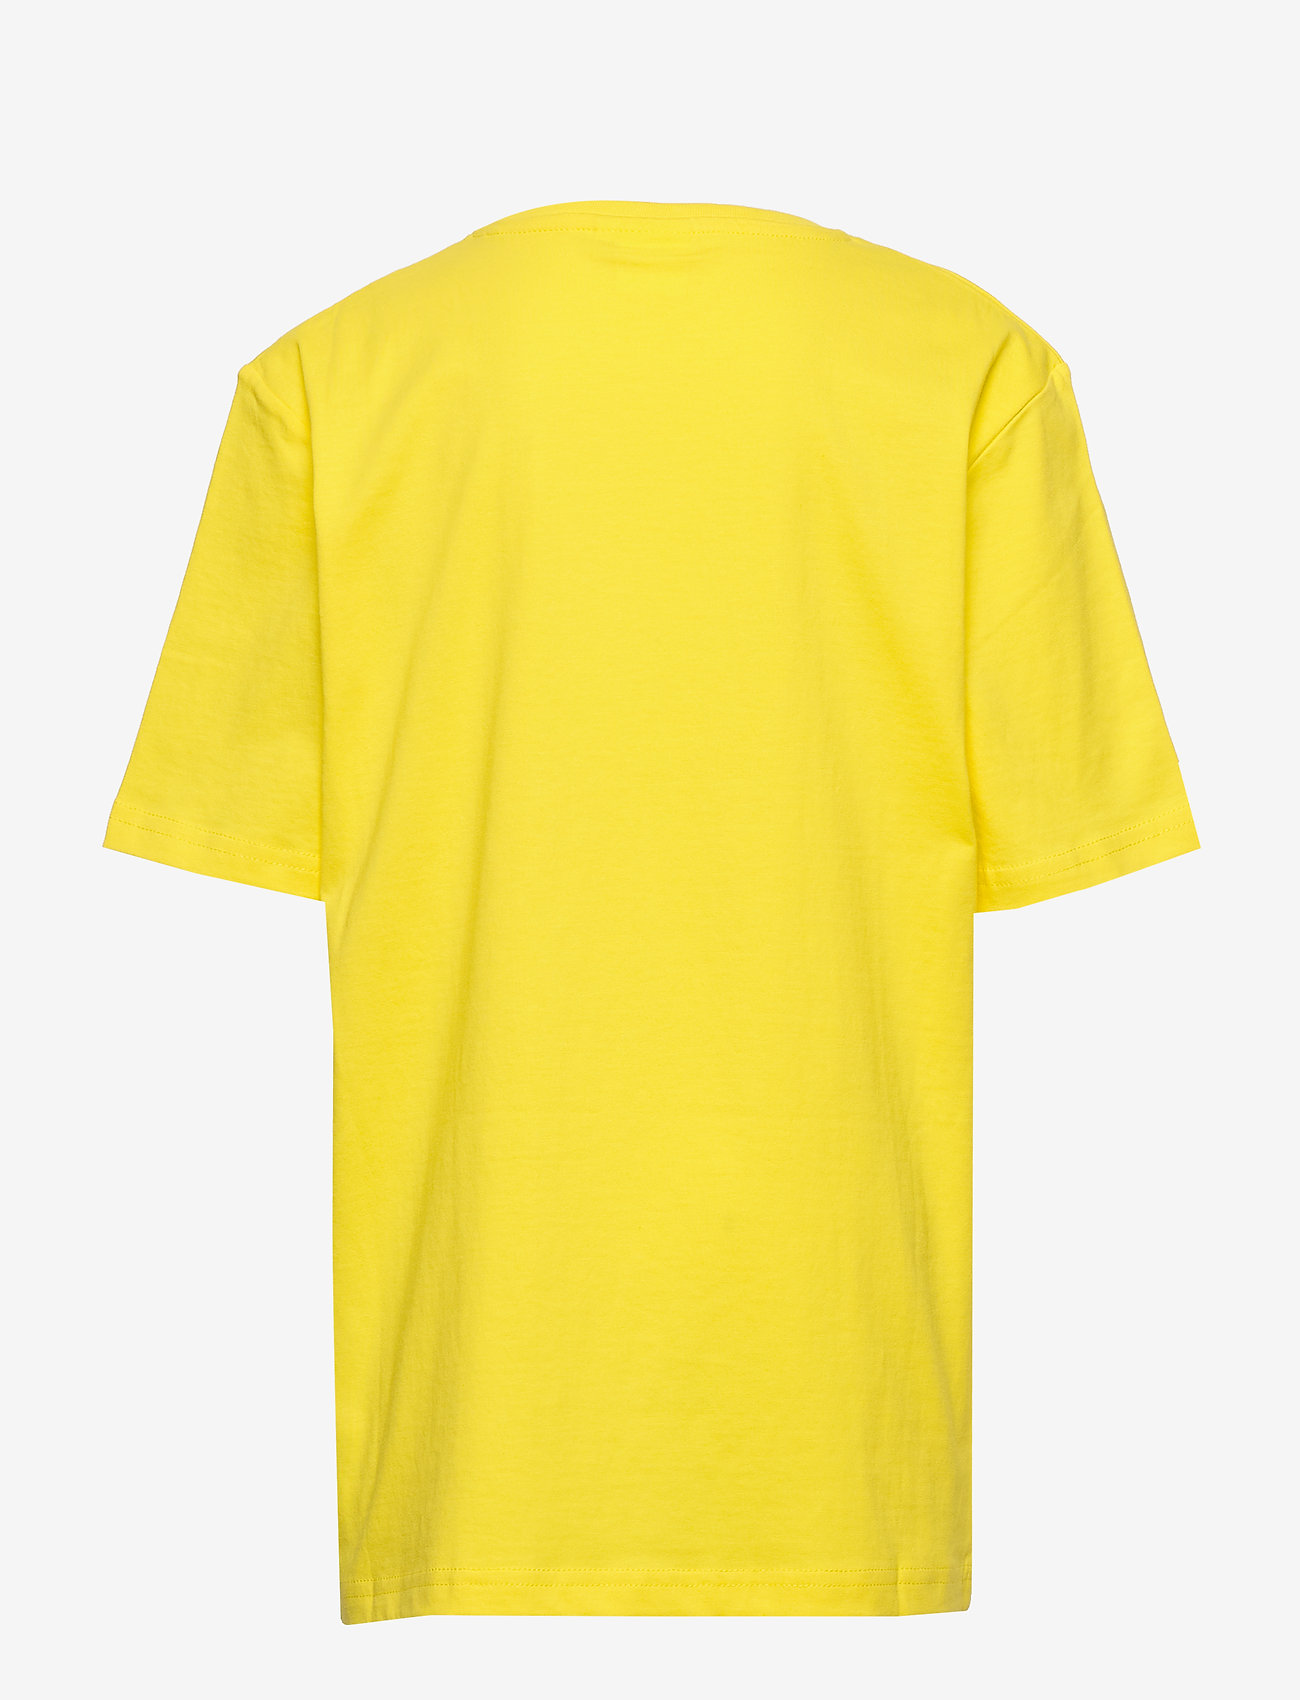 BOSS Yellow Logo Tee